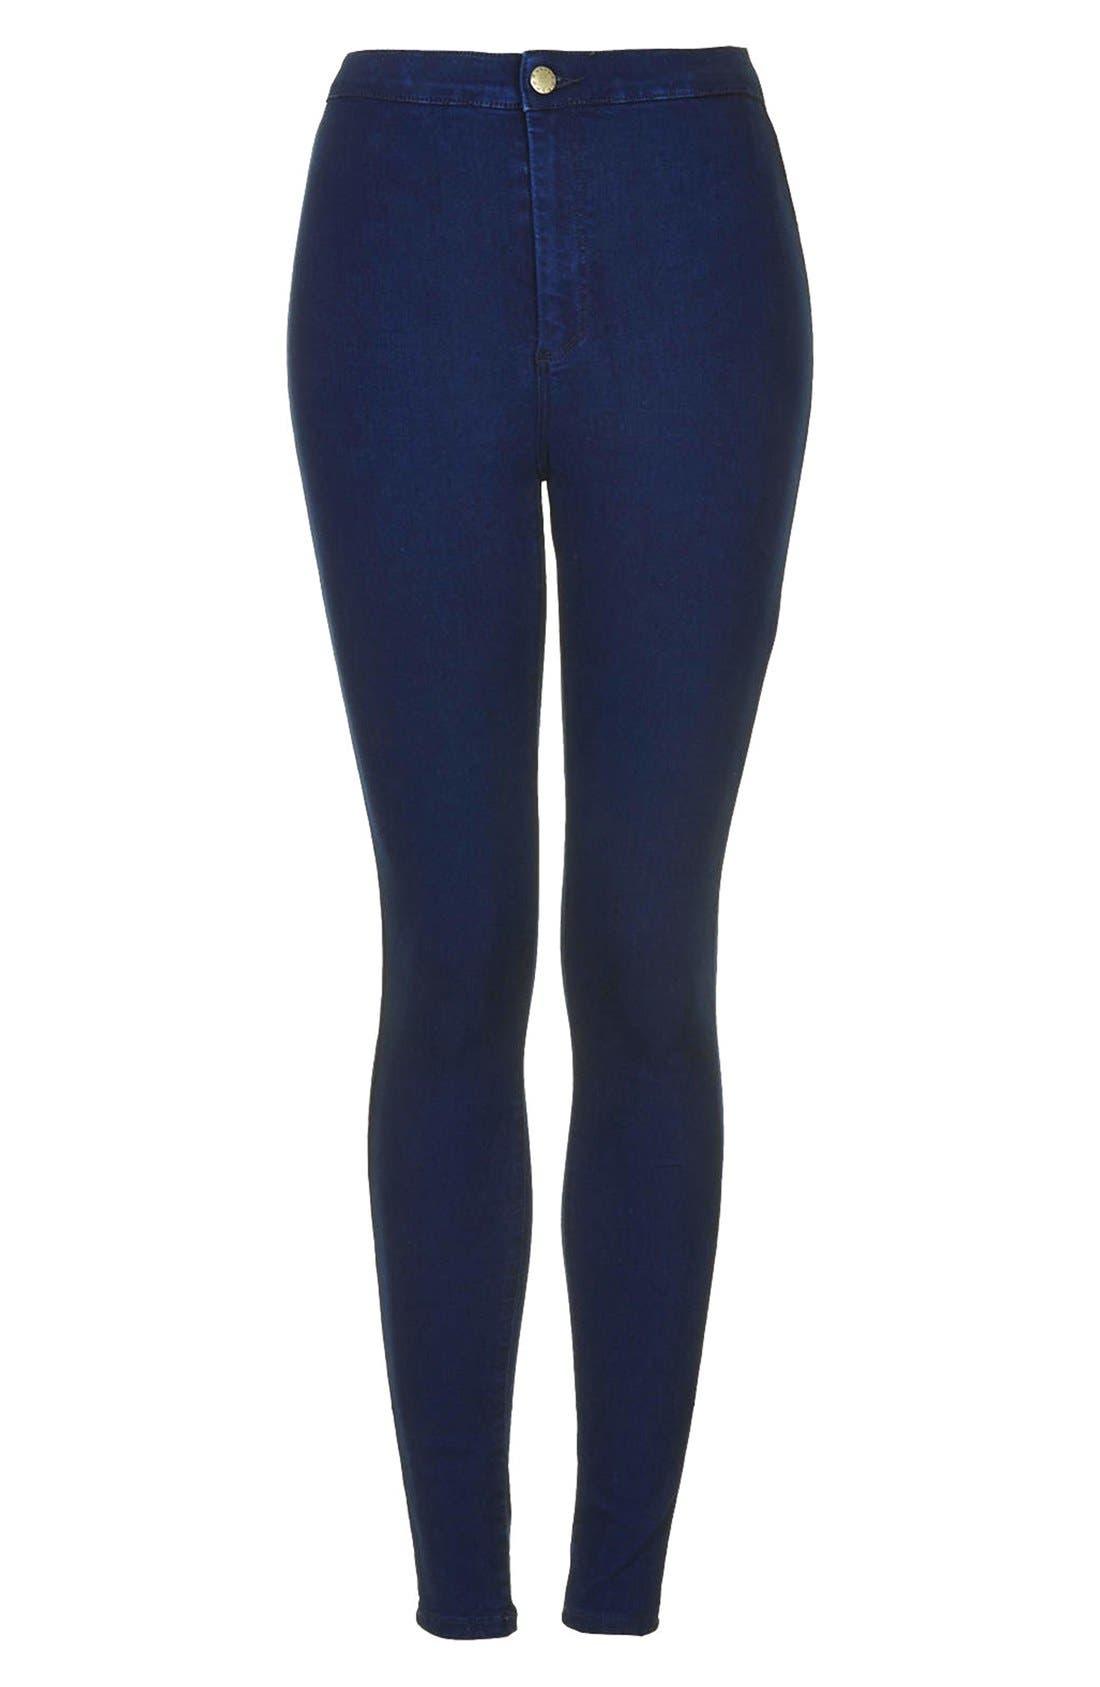 Alternate Image 3  - Topshop Moto 'Joni' High Waist Skinny Jeans (Blue)